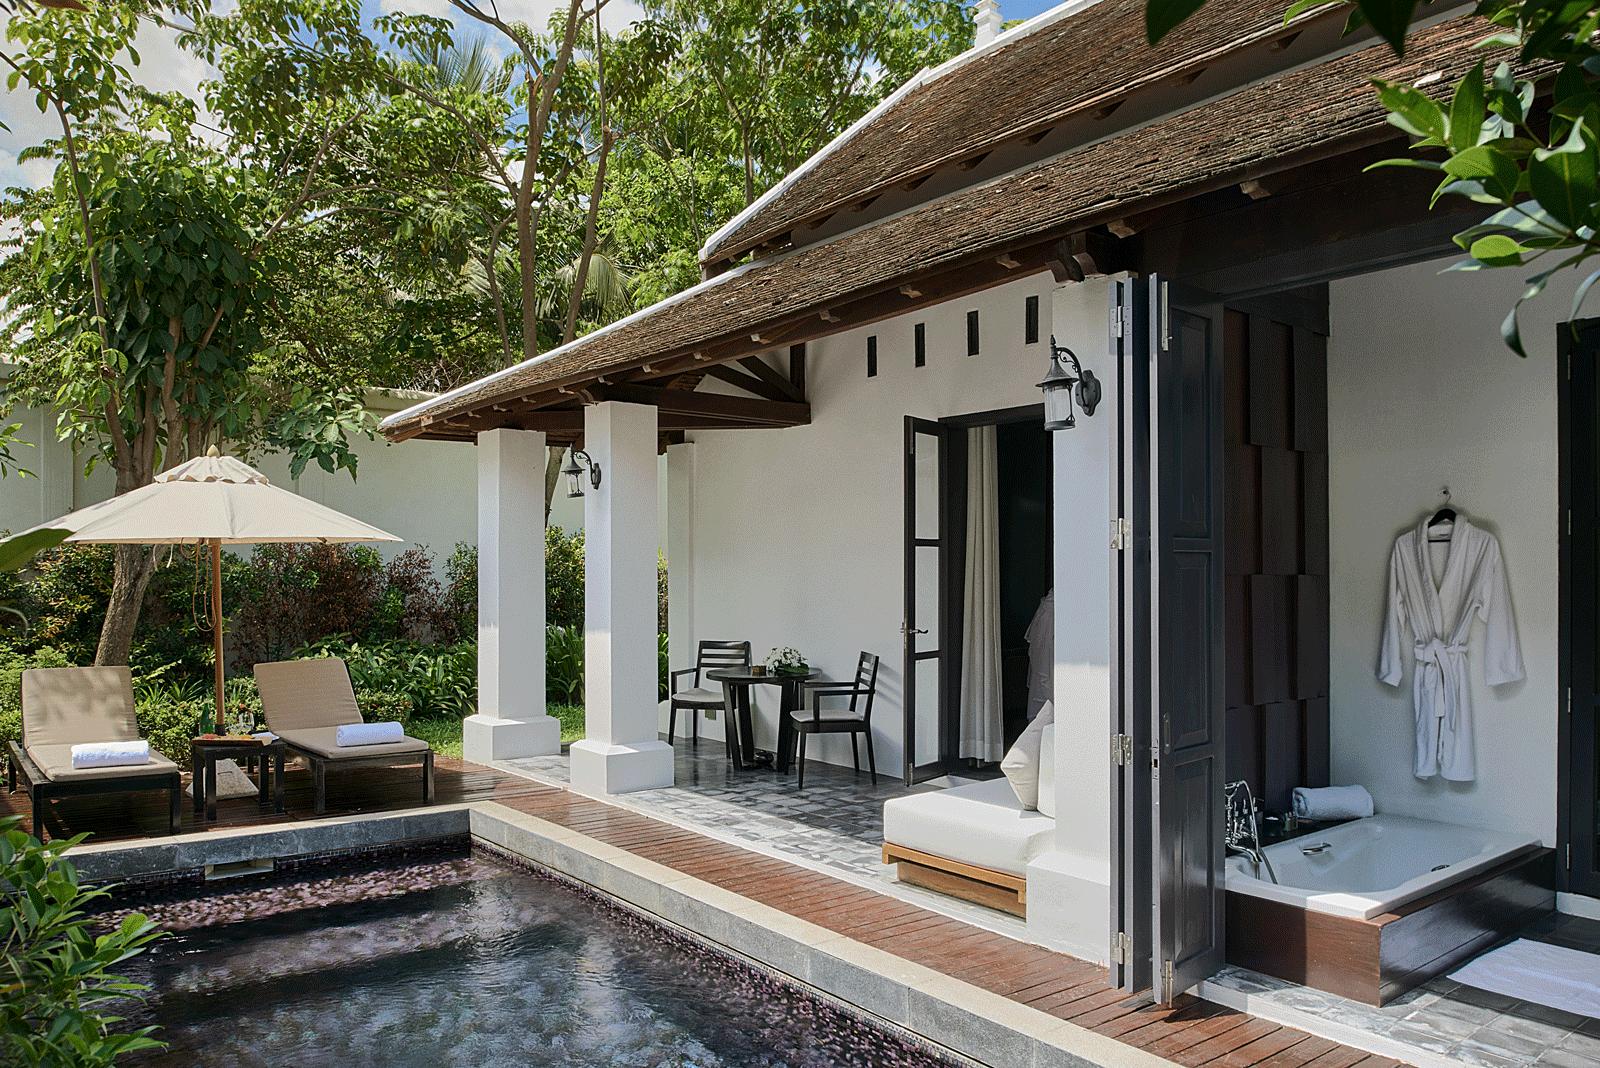 Sofitel-Luang-Prabang---Pool-villa.png